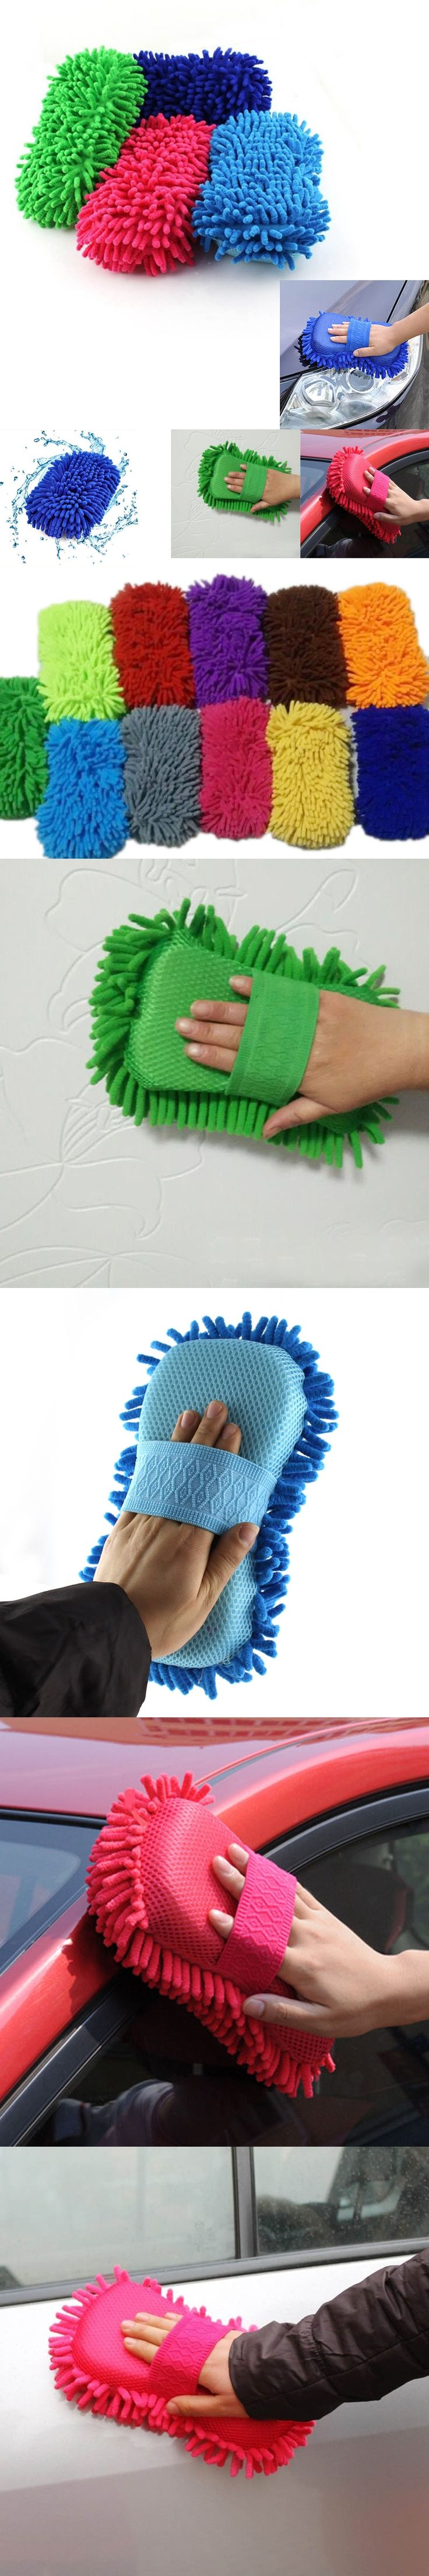 Hand Soft Towel Microfiber Chenille Anthozoan Washing Gloves Coral Fleece Sponge Car Washer 2017ing